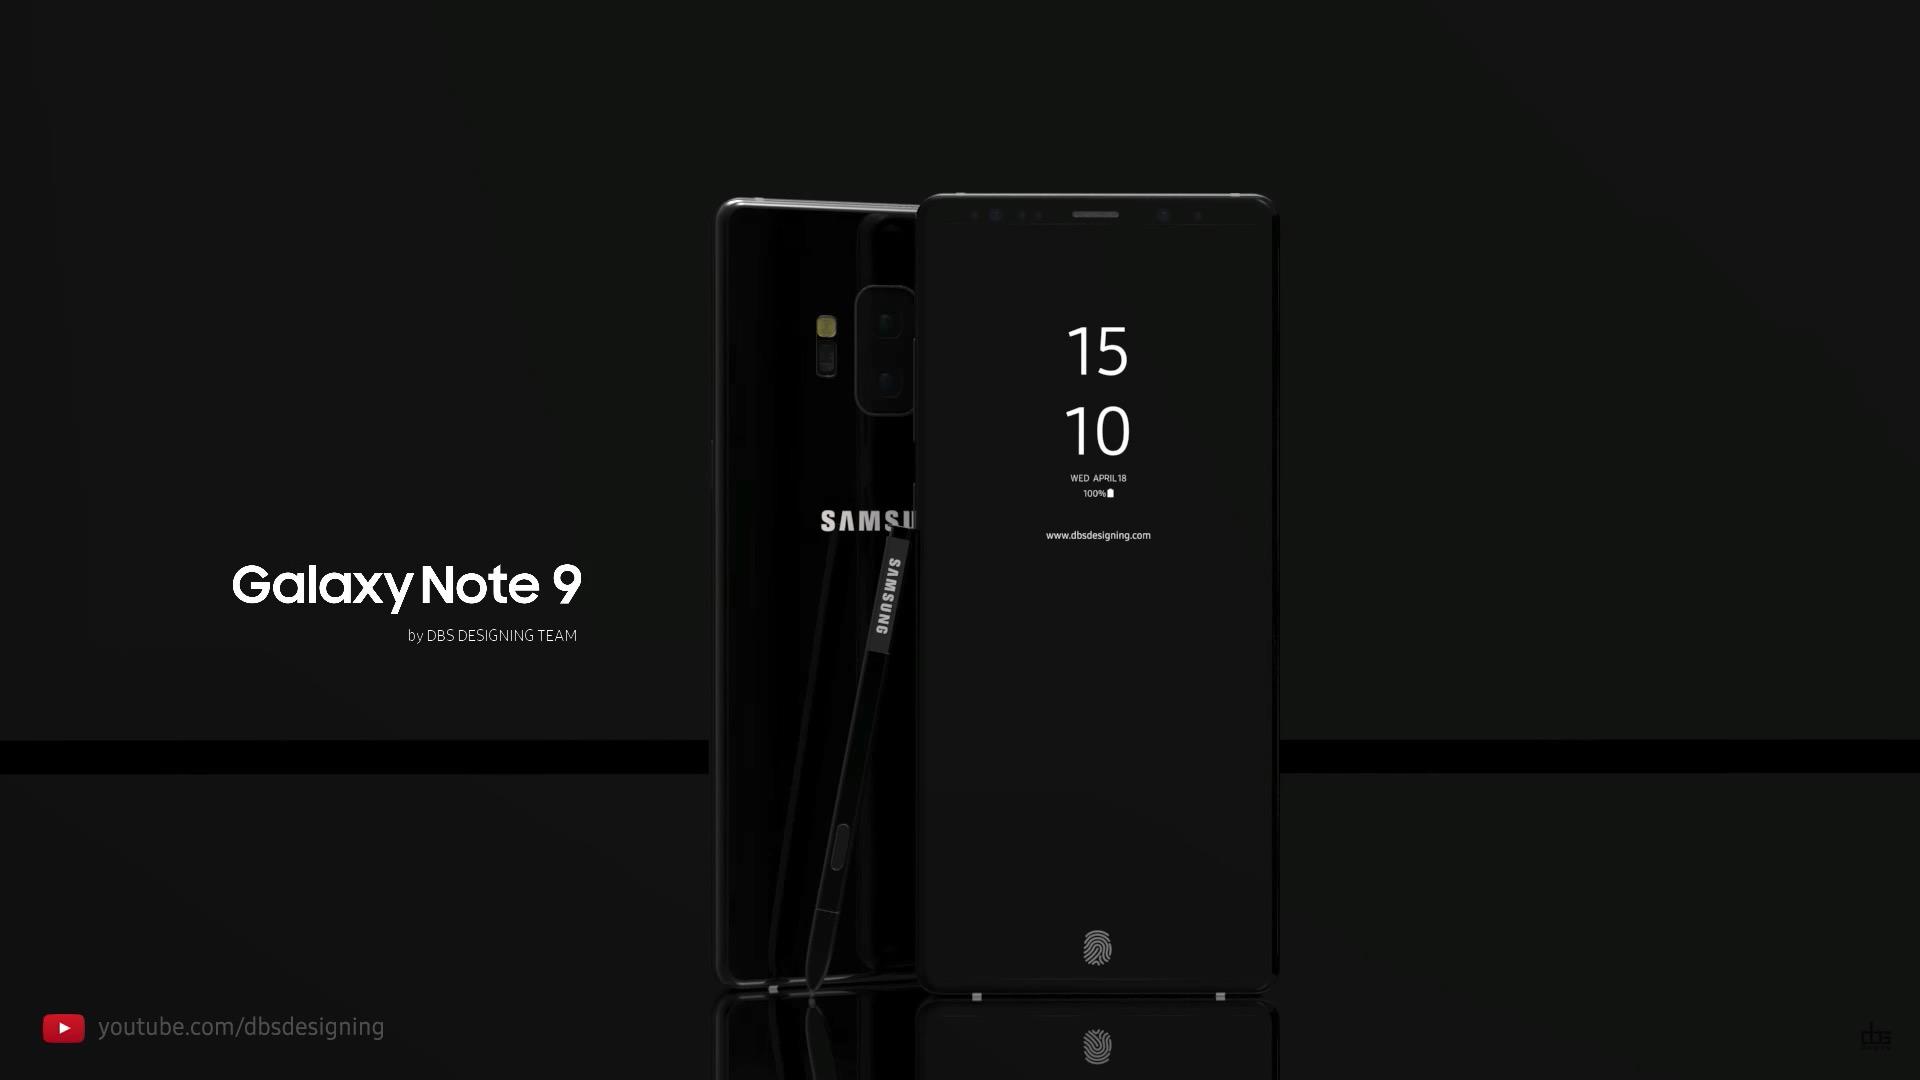 Samsung Galaxy Note 9 IPhone X